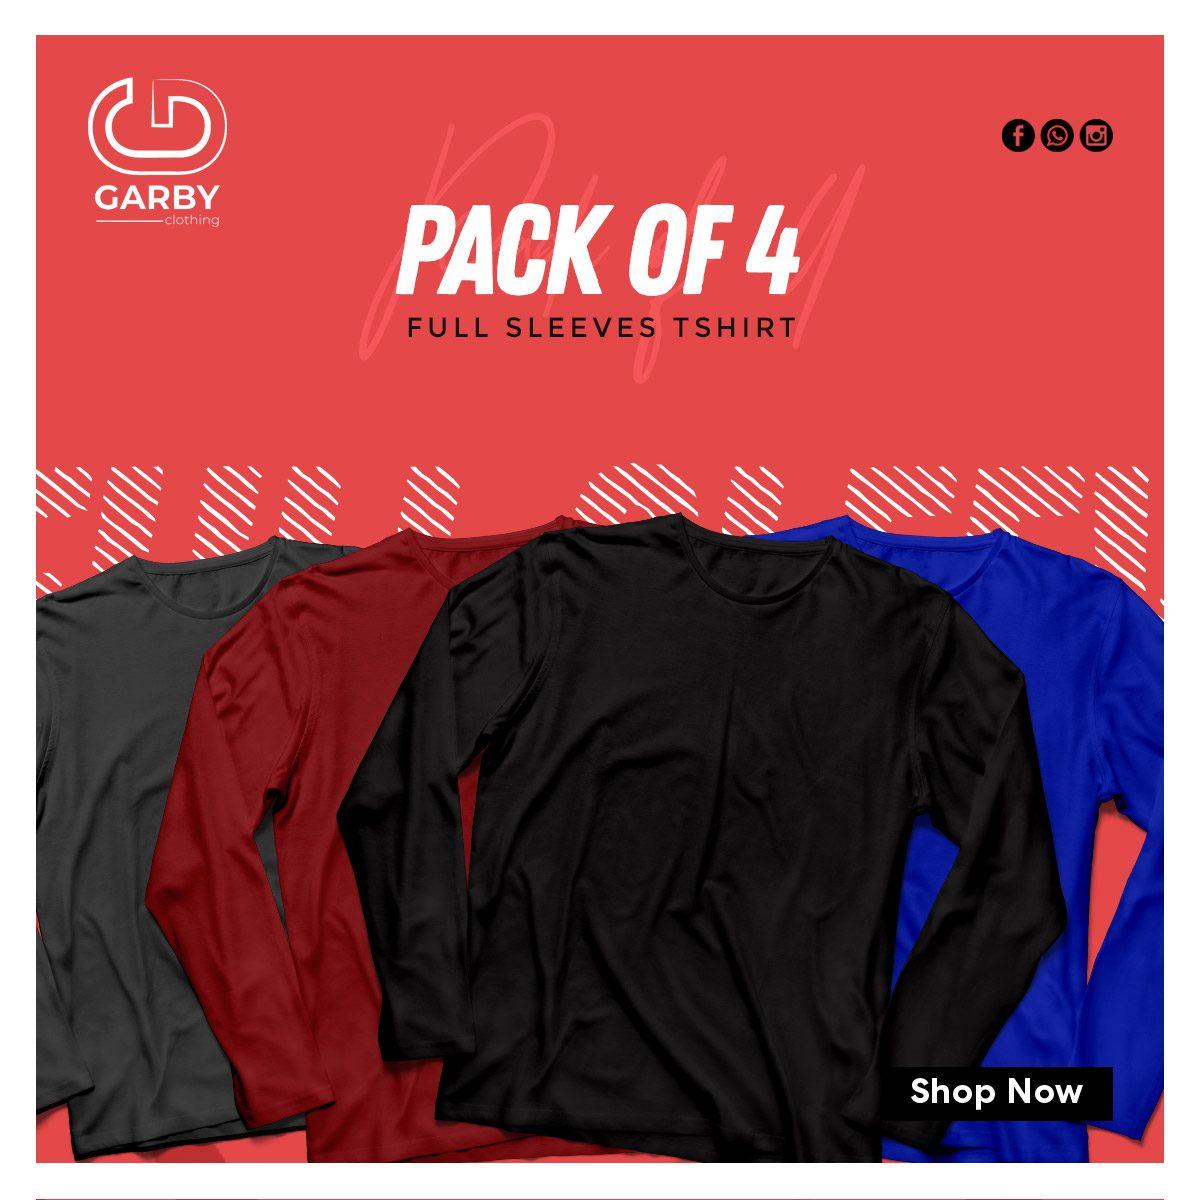 Pack-of-the-4-full-sleeves